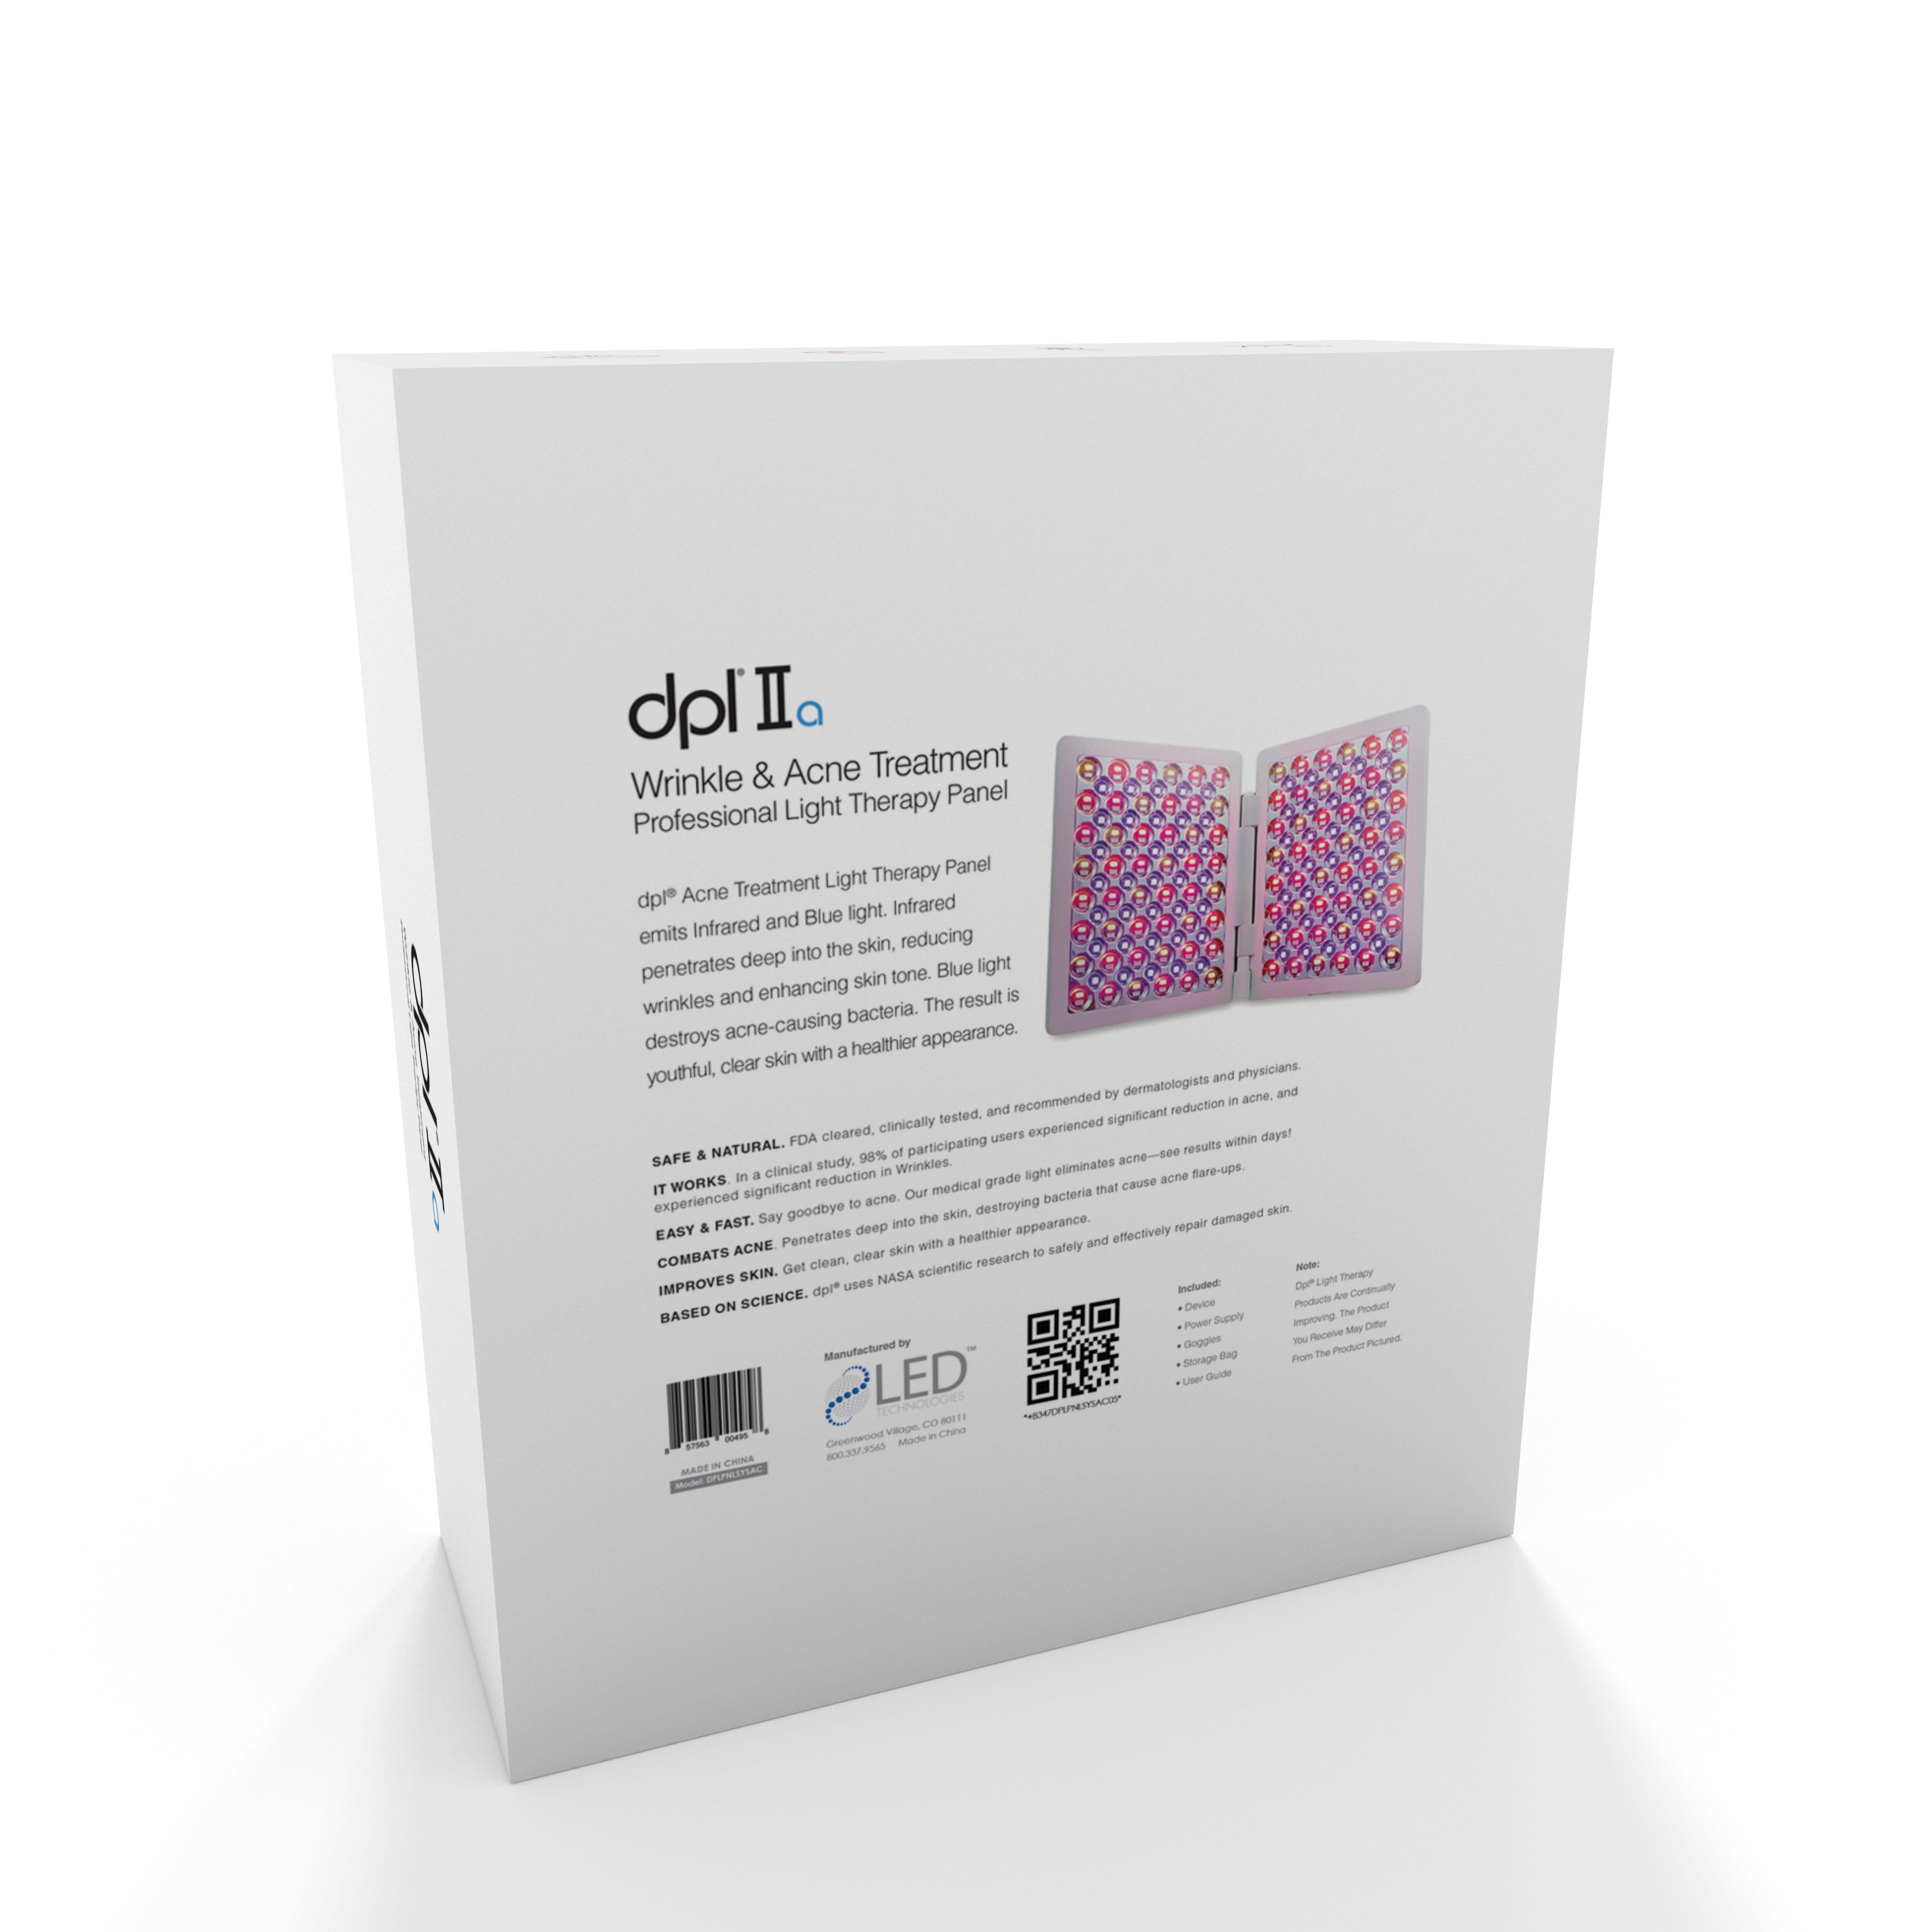 dpl IIa Professional Acne Treatment Light Therapy